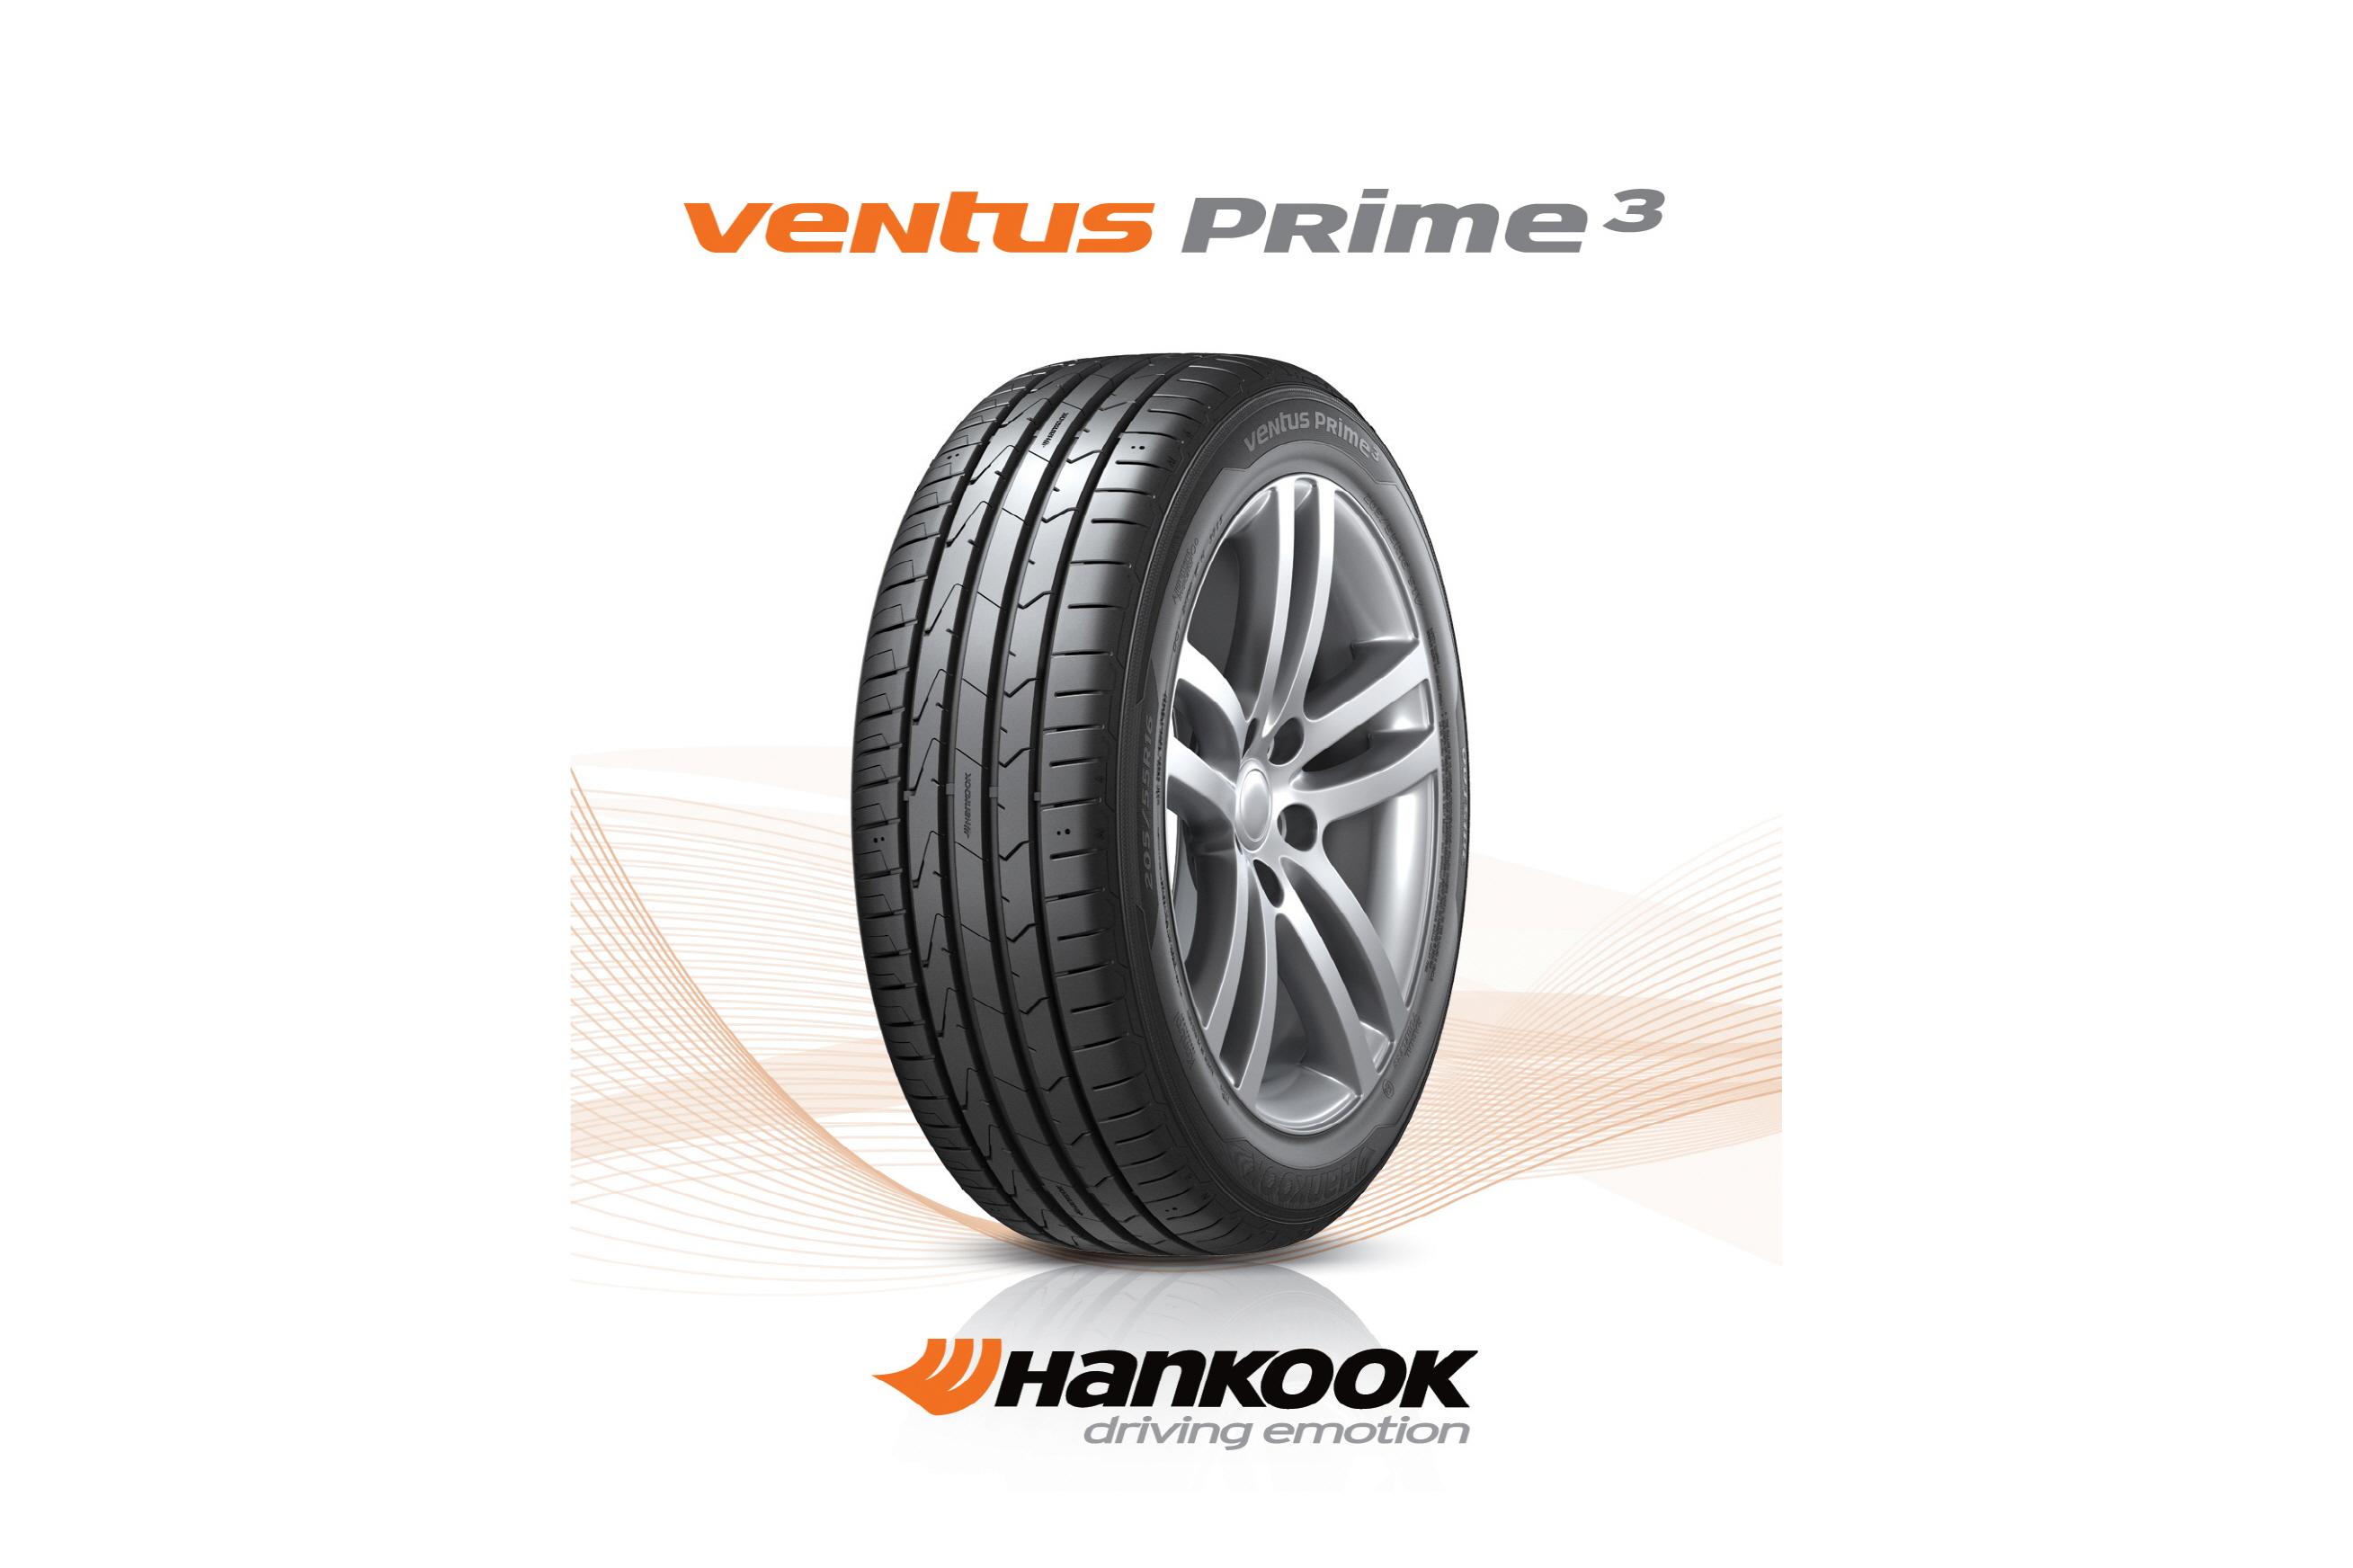 Hankook Ventus Prime 3